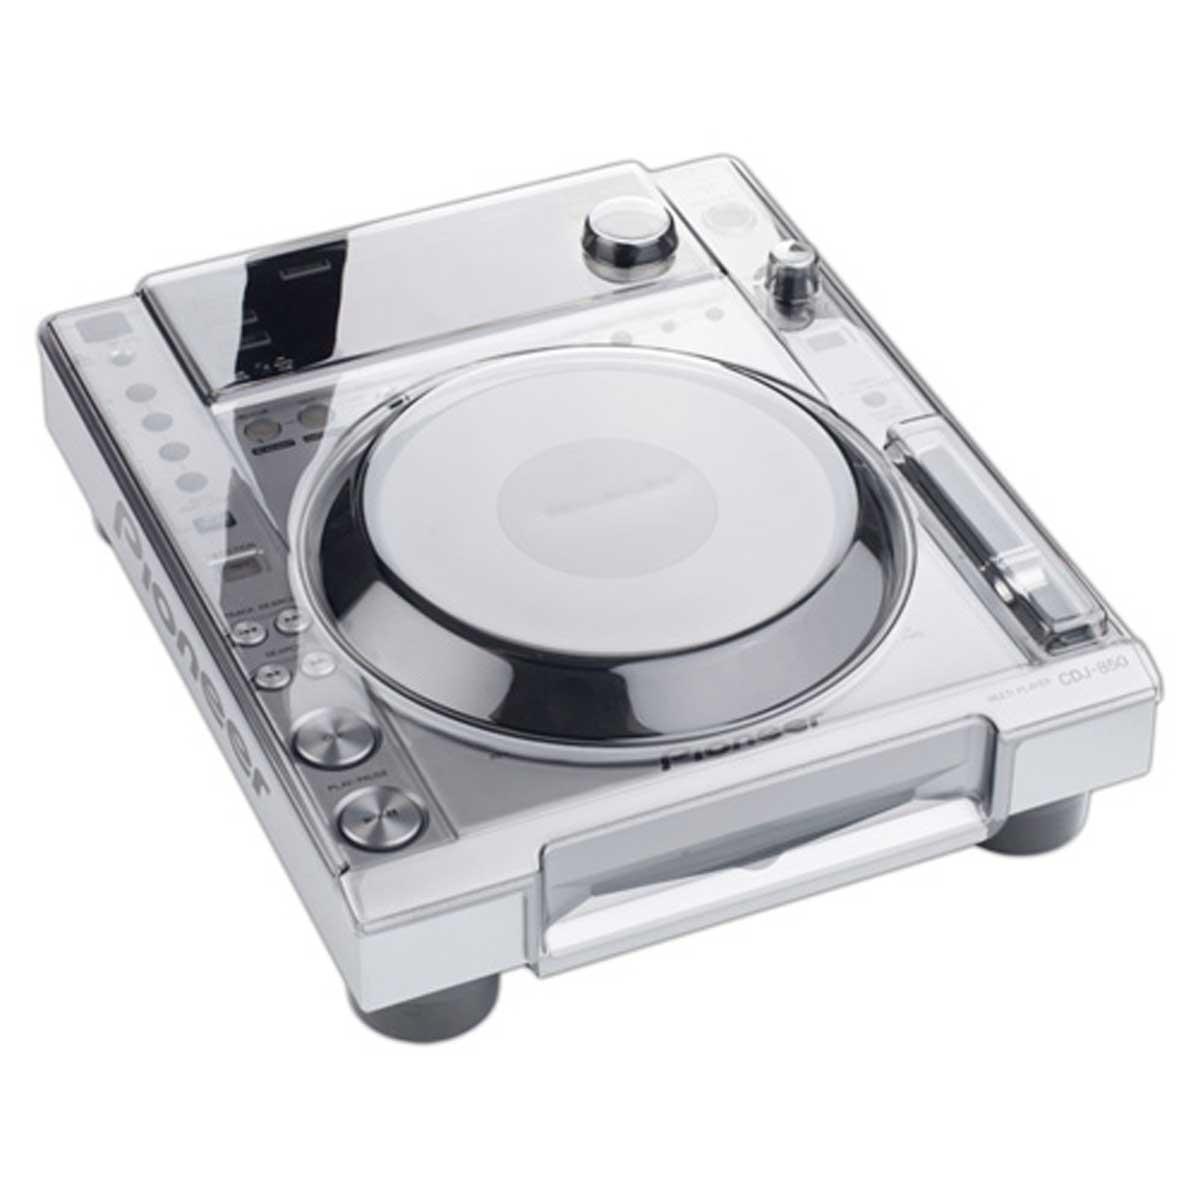 Decksaver デッキセーバー / DS-PC-CDJ850 CDJ-850用保護カバー【お取り寄せ商品】